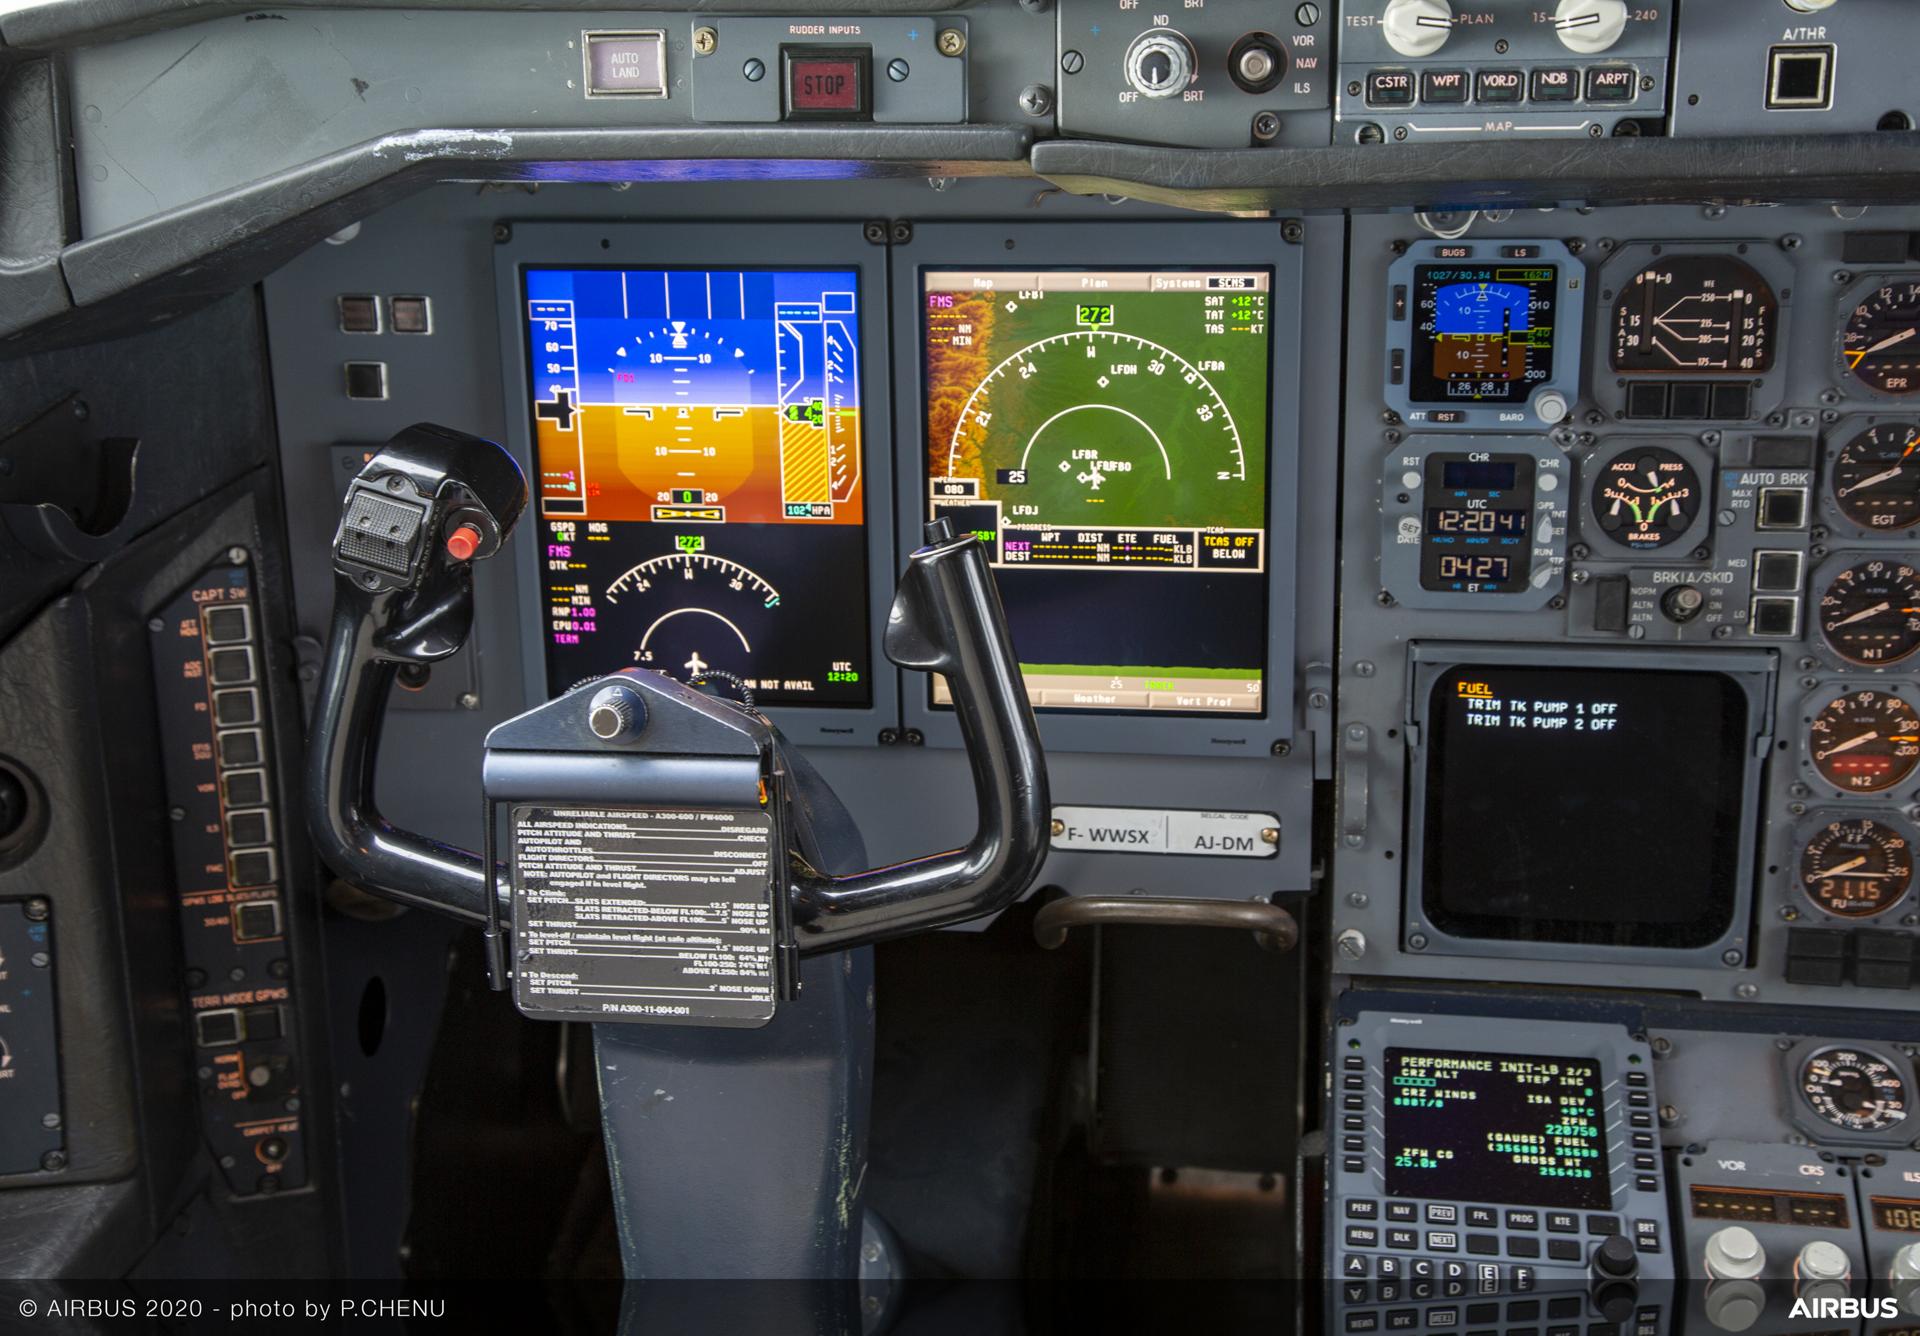 UPS A300 600F Cockpit Upgrade